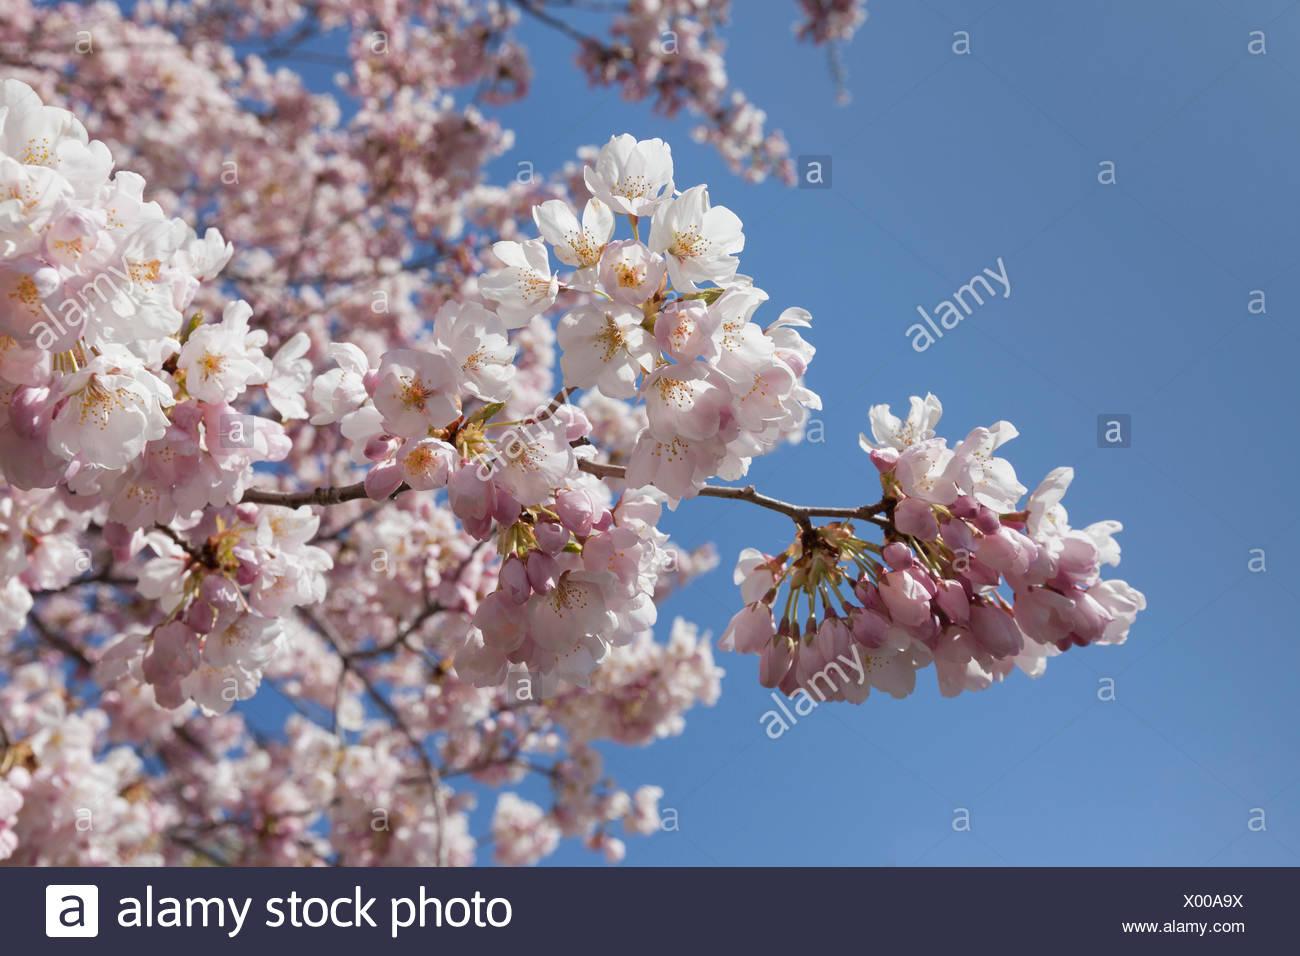 Japanese Cherry Tree Stock Photos & Japanese Cherry Tree Stock ...